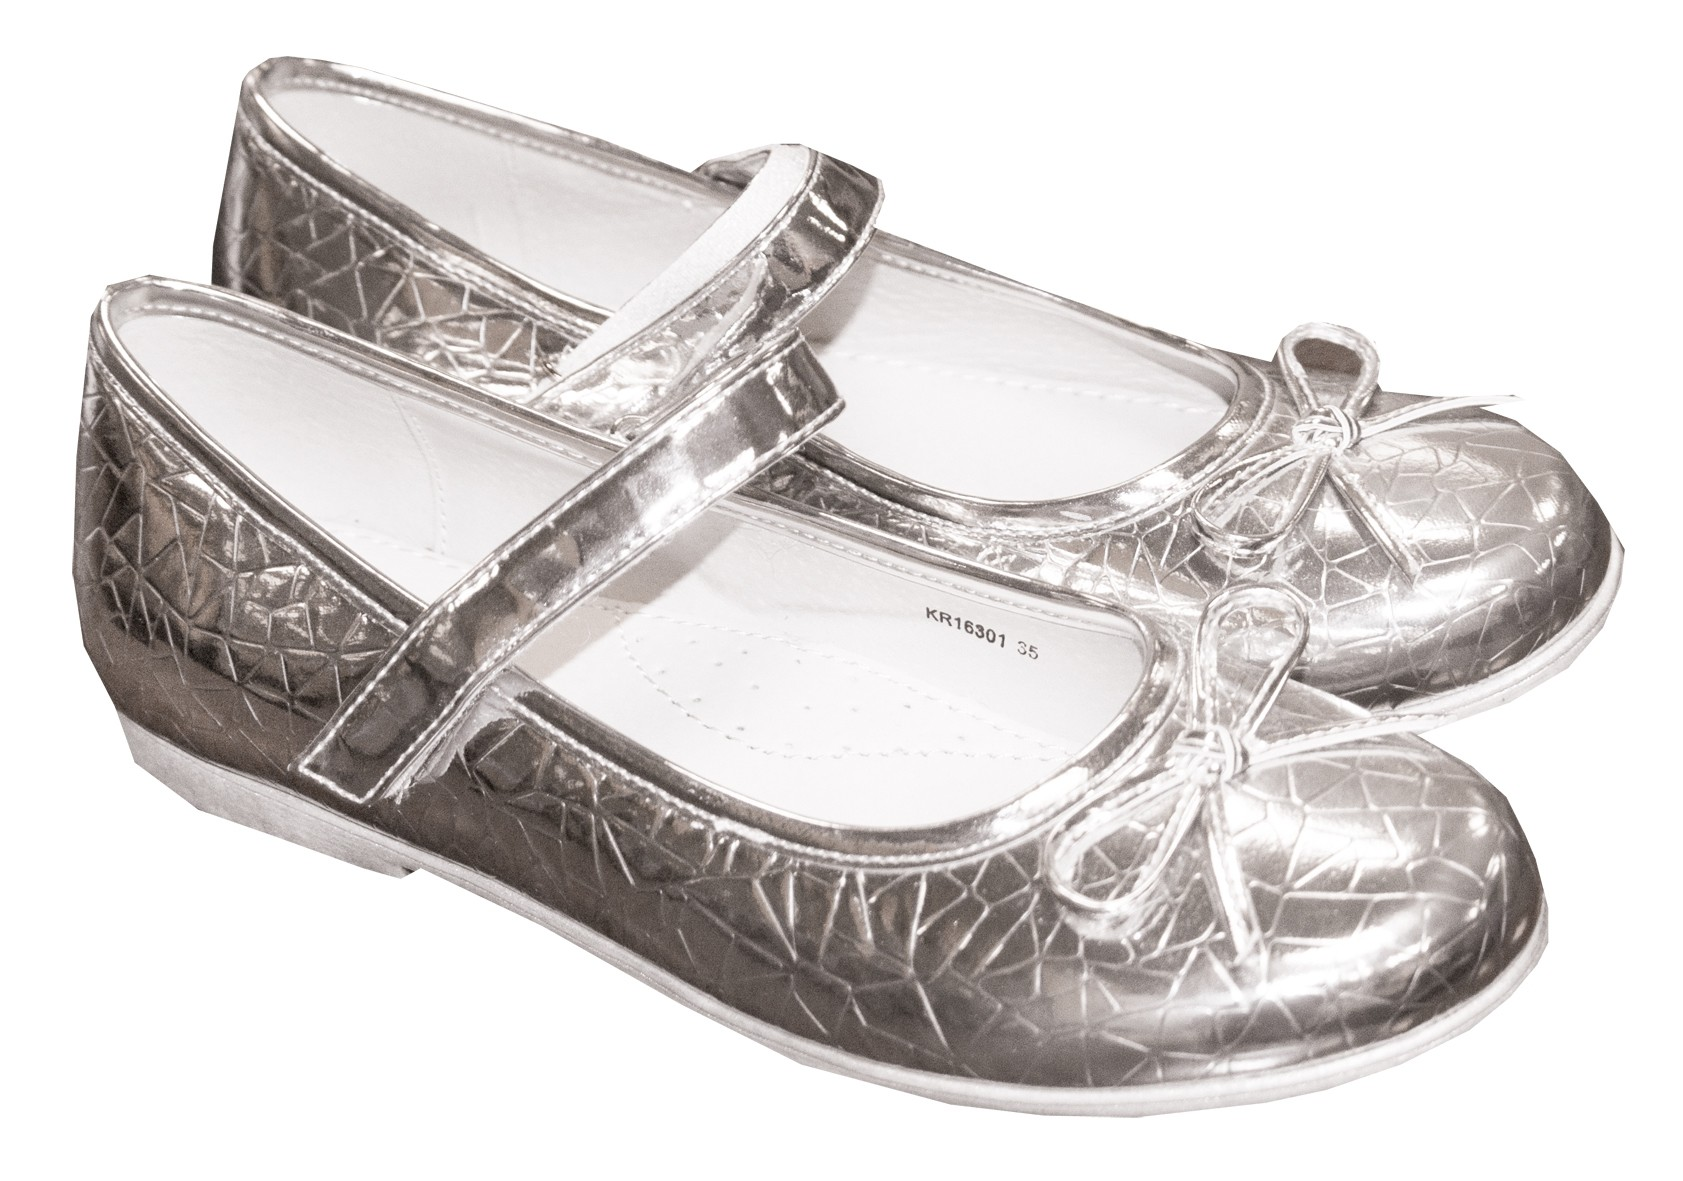 Туфли Barkito Туфли для девочки Barkito, серебристые туфли acoola для девочки цвет серебряный